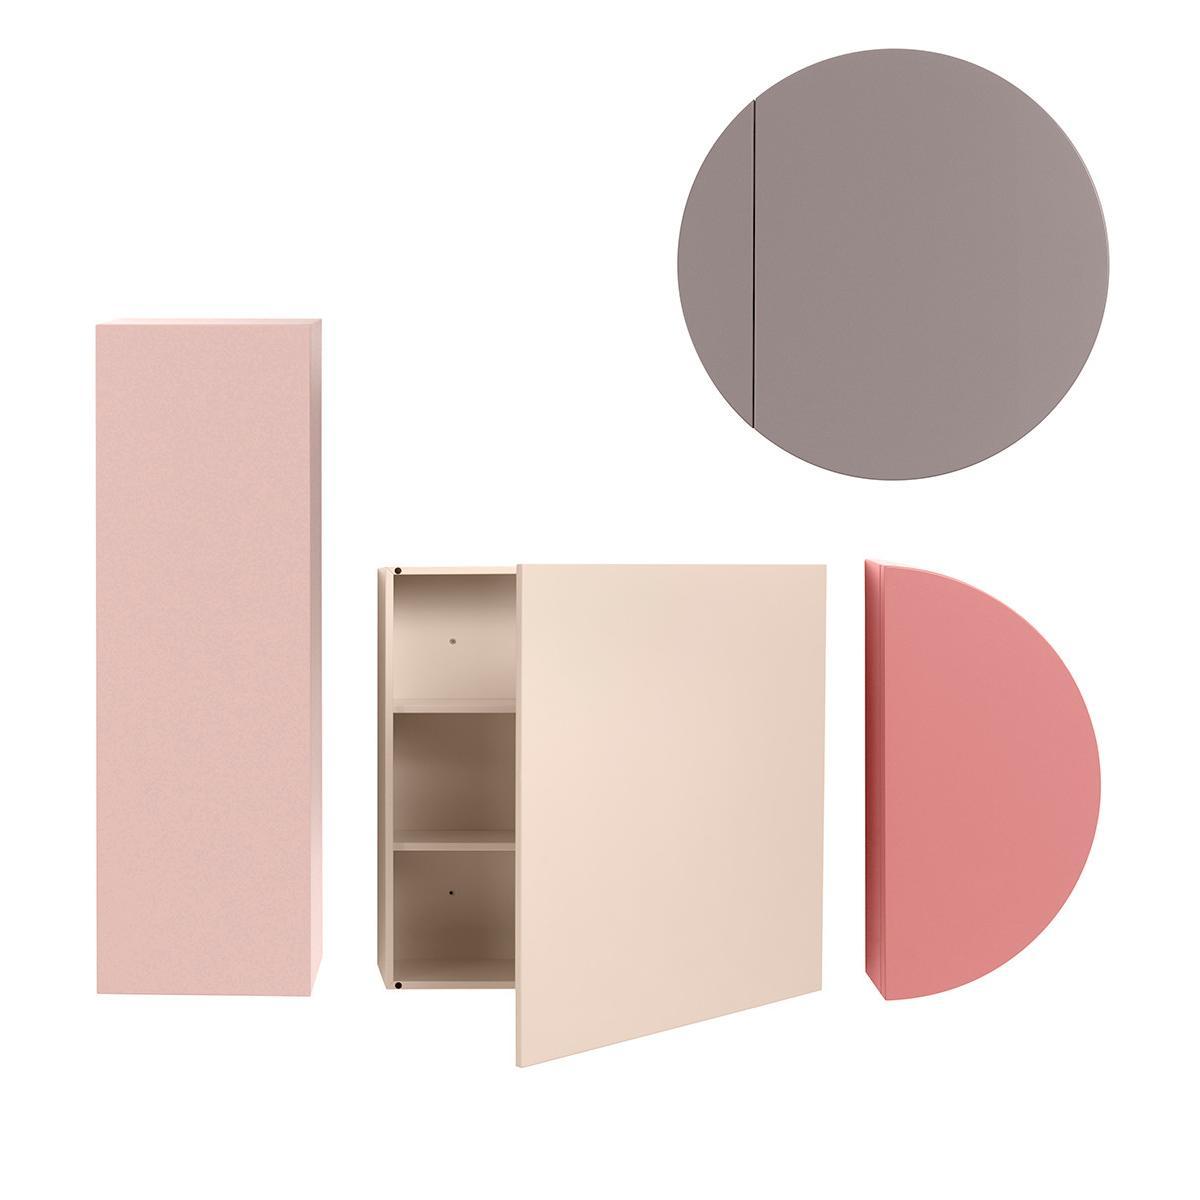 SIMETRIA Wandschrank, Rechteck, Quadrat, Kreis und Halbkreis